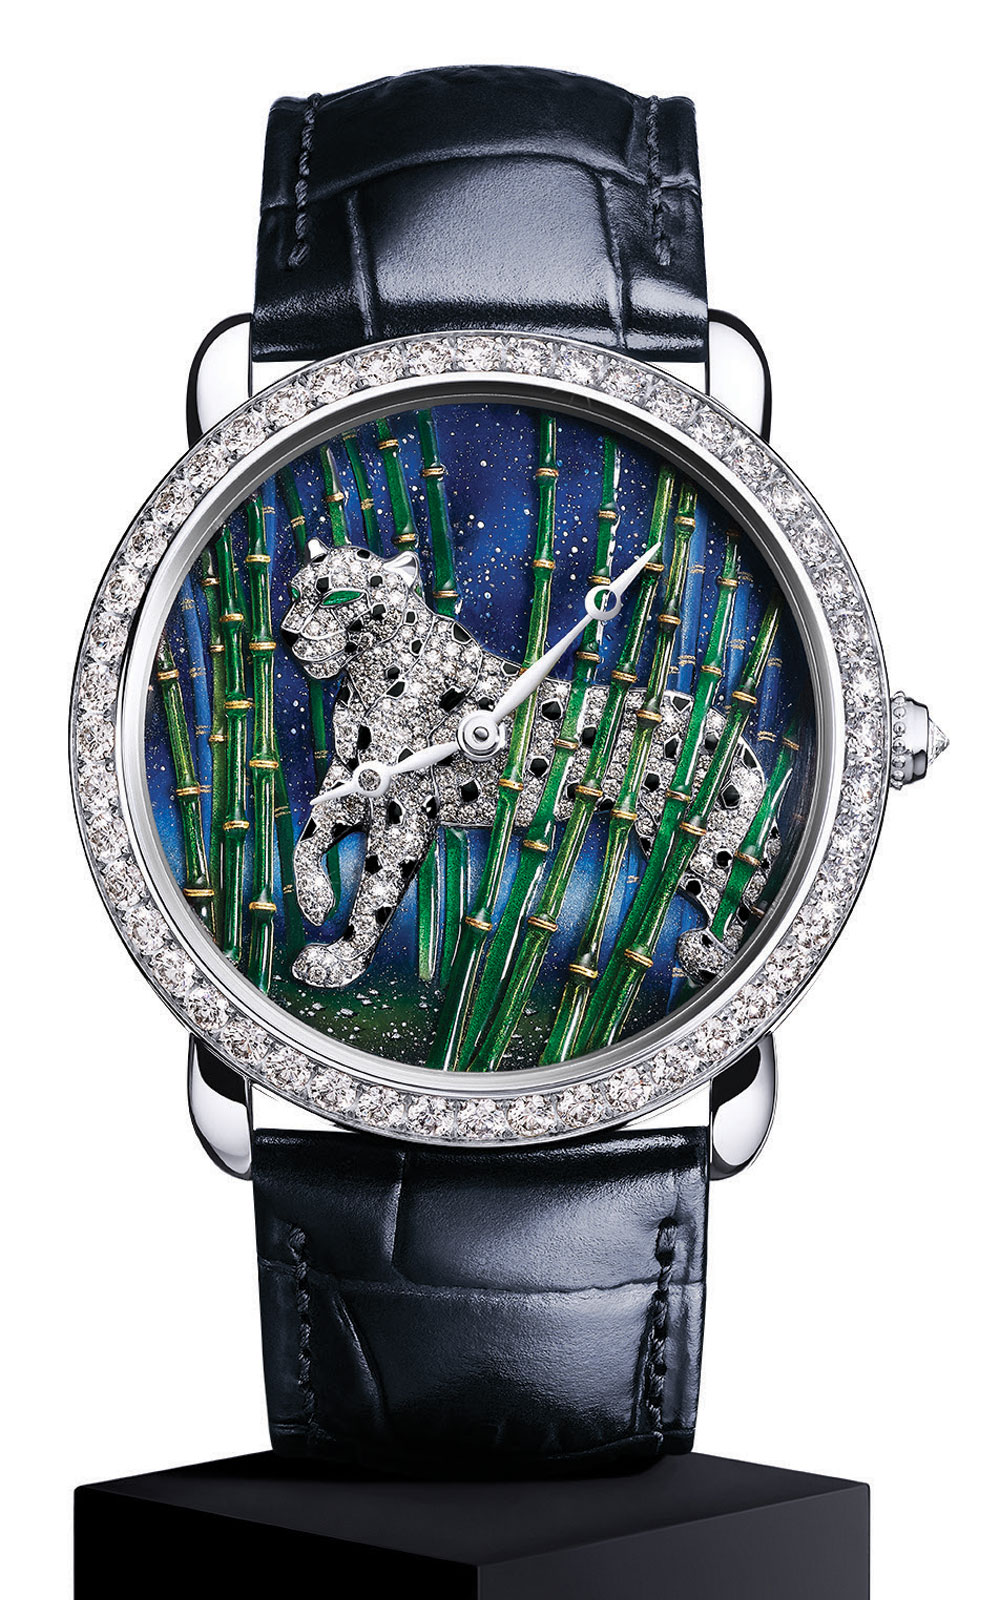 Đồng hồ Ronde Louis Cartier Enamel Filigree